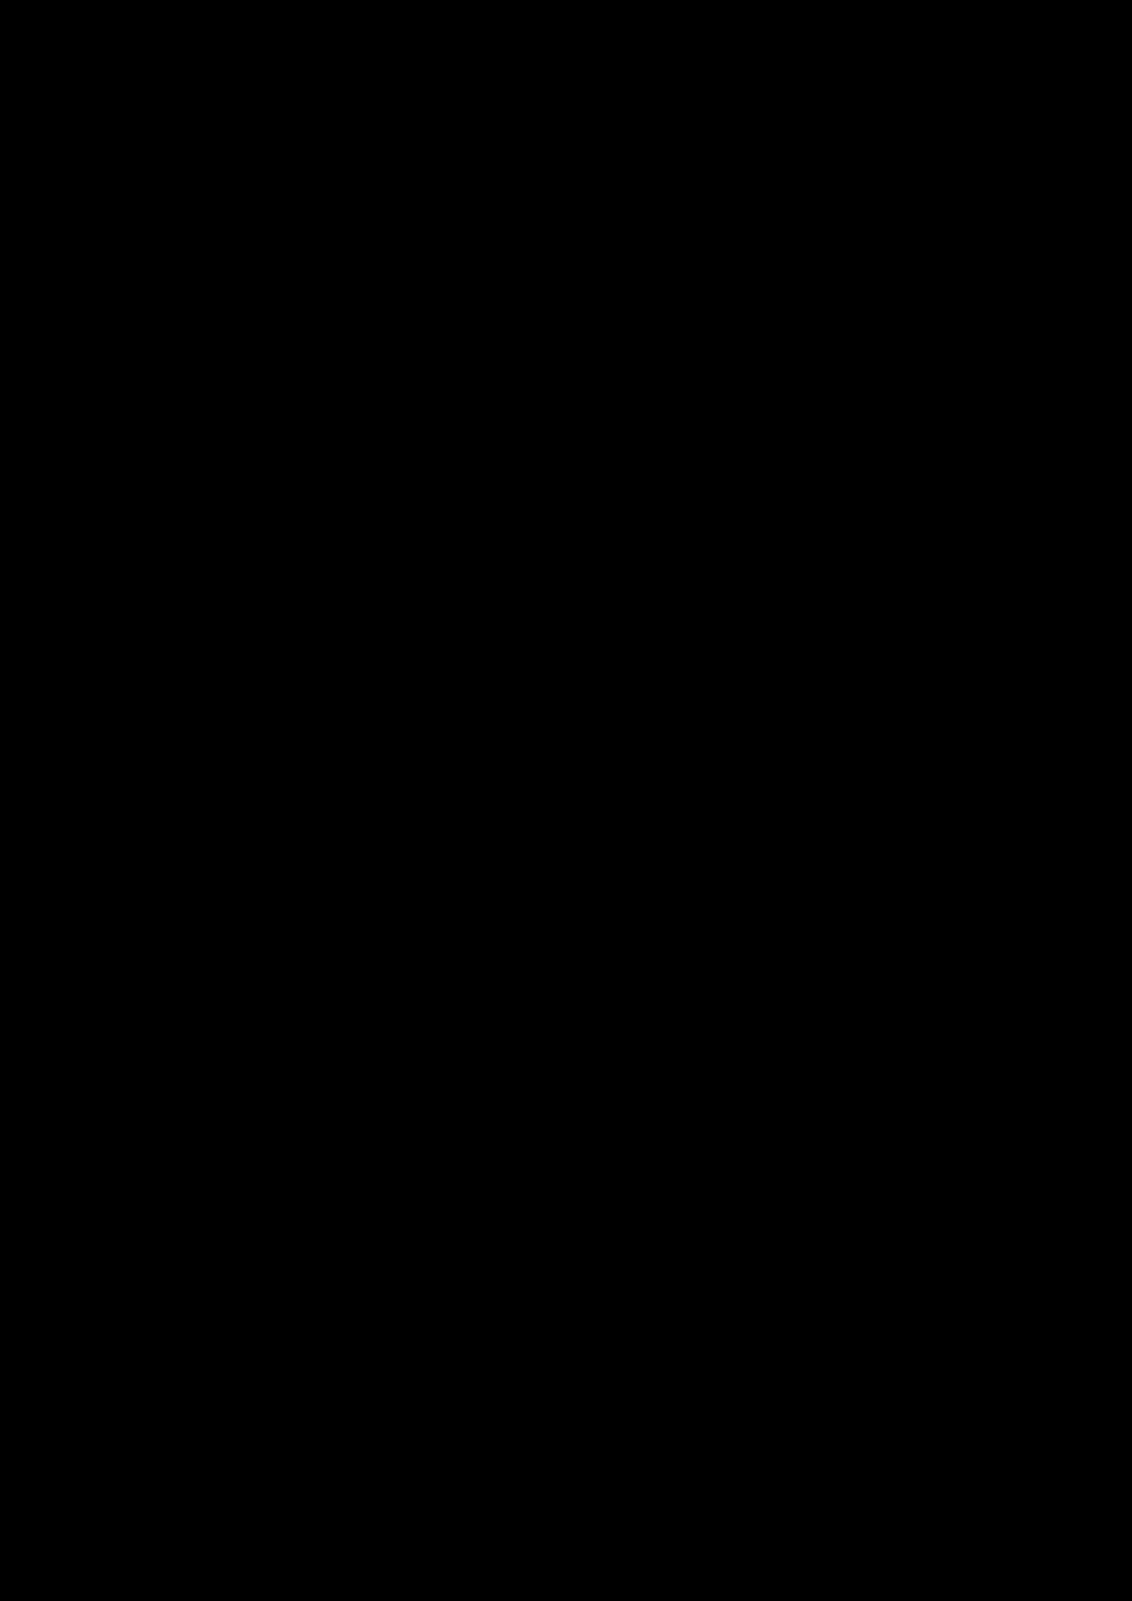 Ten lyubvi slide, Image 26